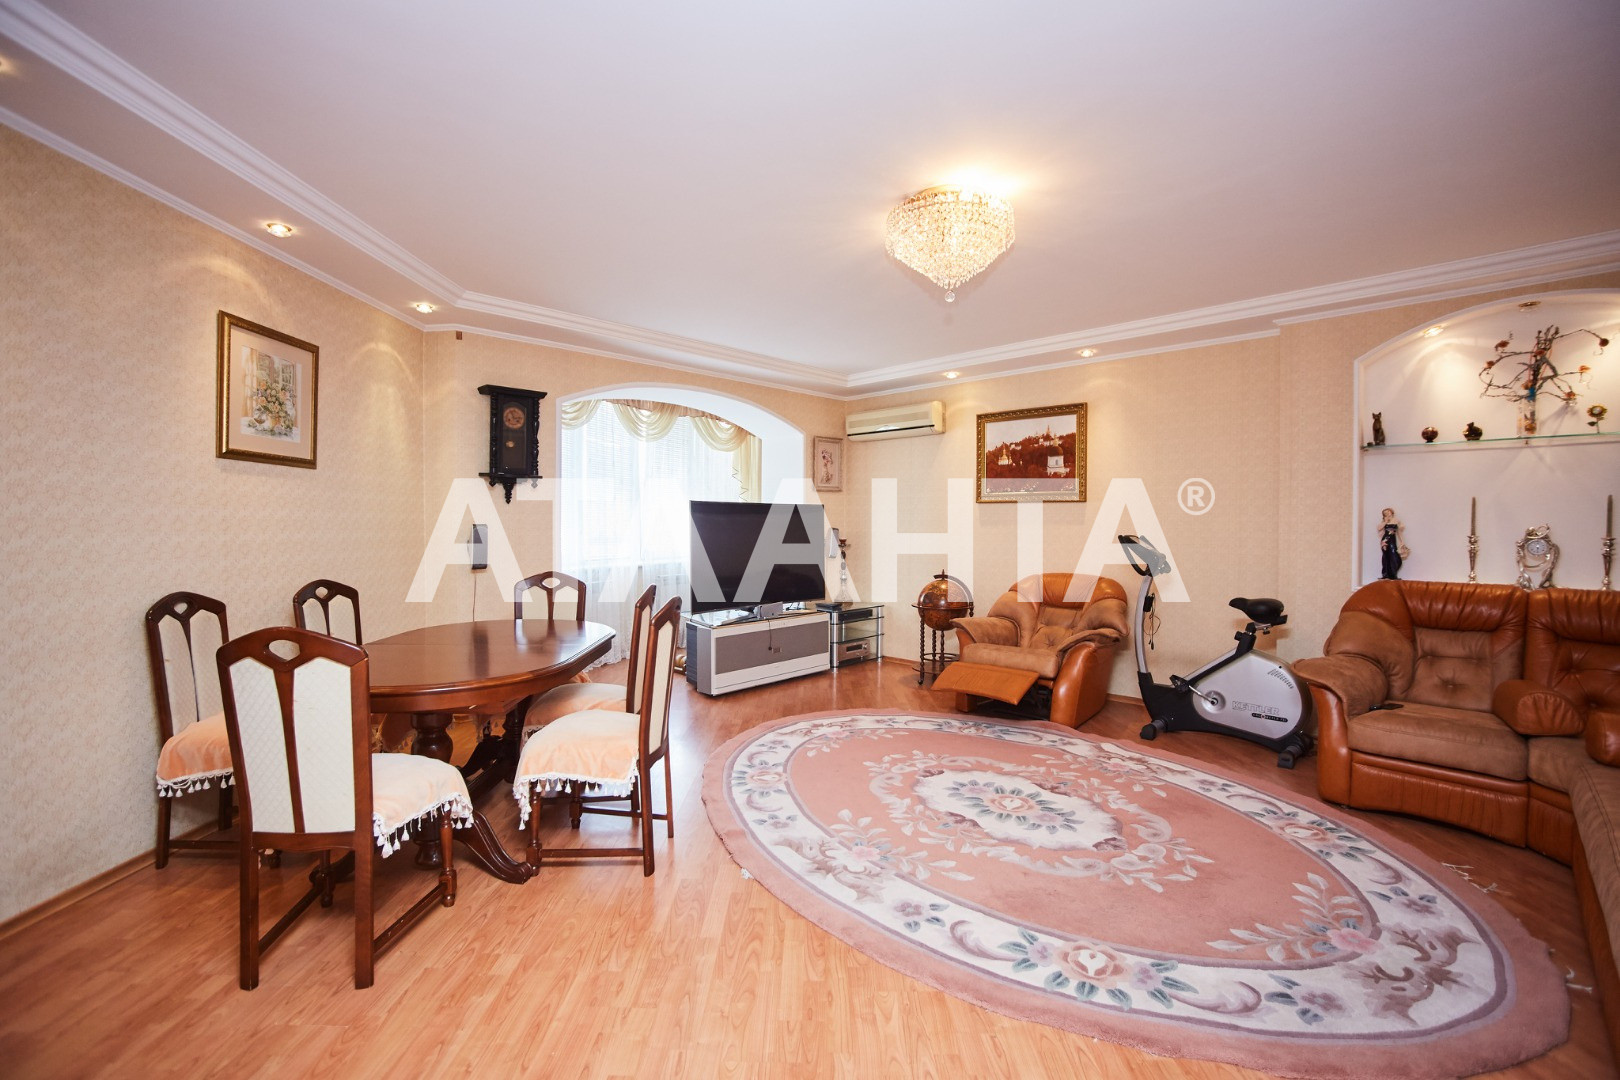 Продается Многоуровневая Квартира на ул. Посмитного — 295 000 у.е. (фото №12)